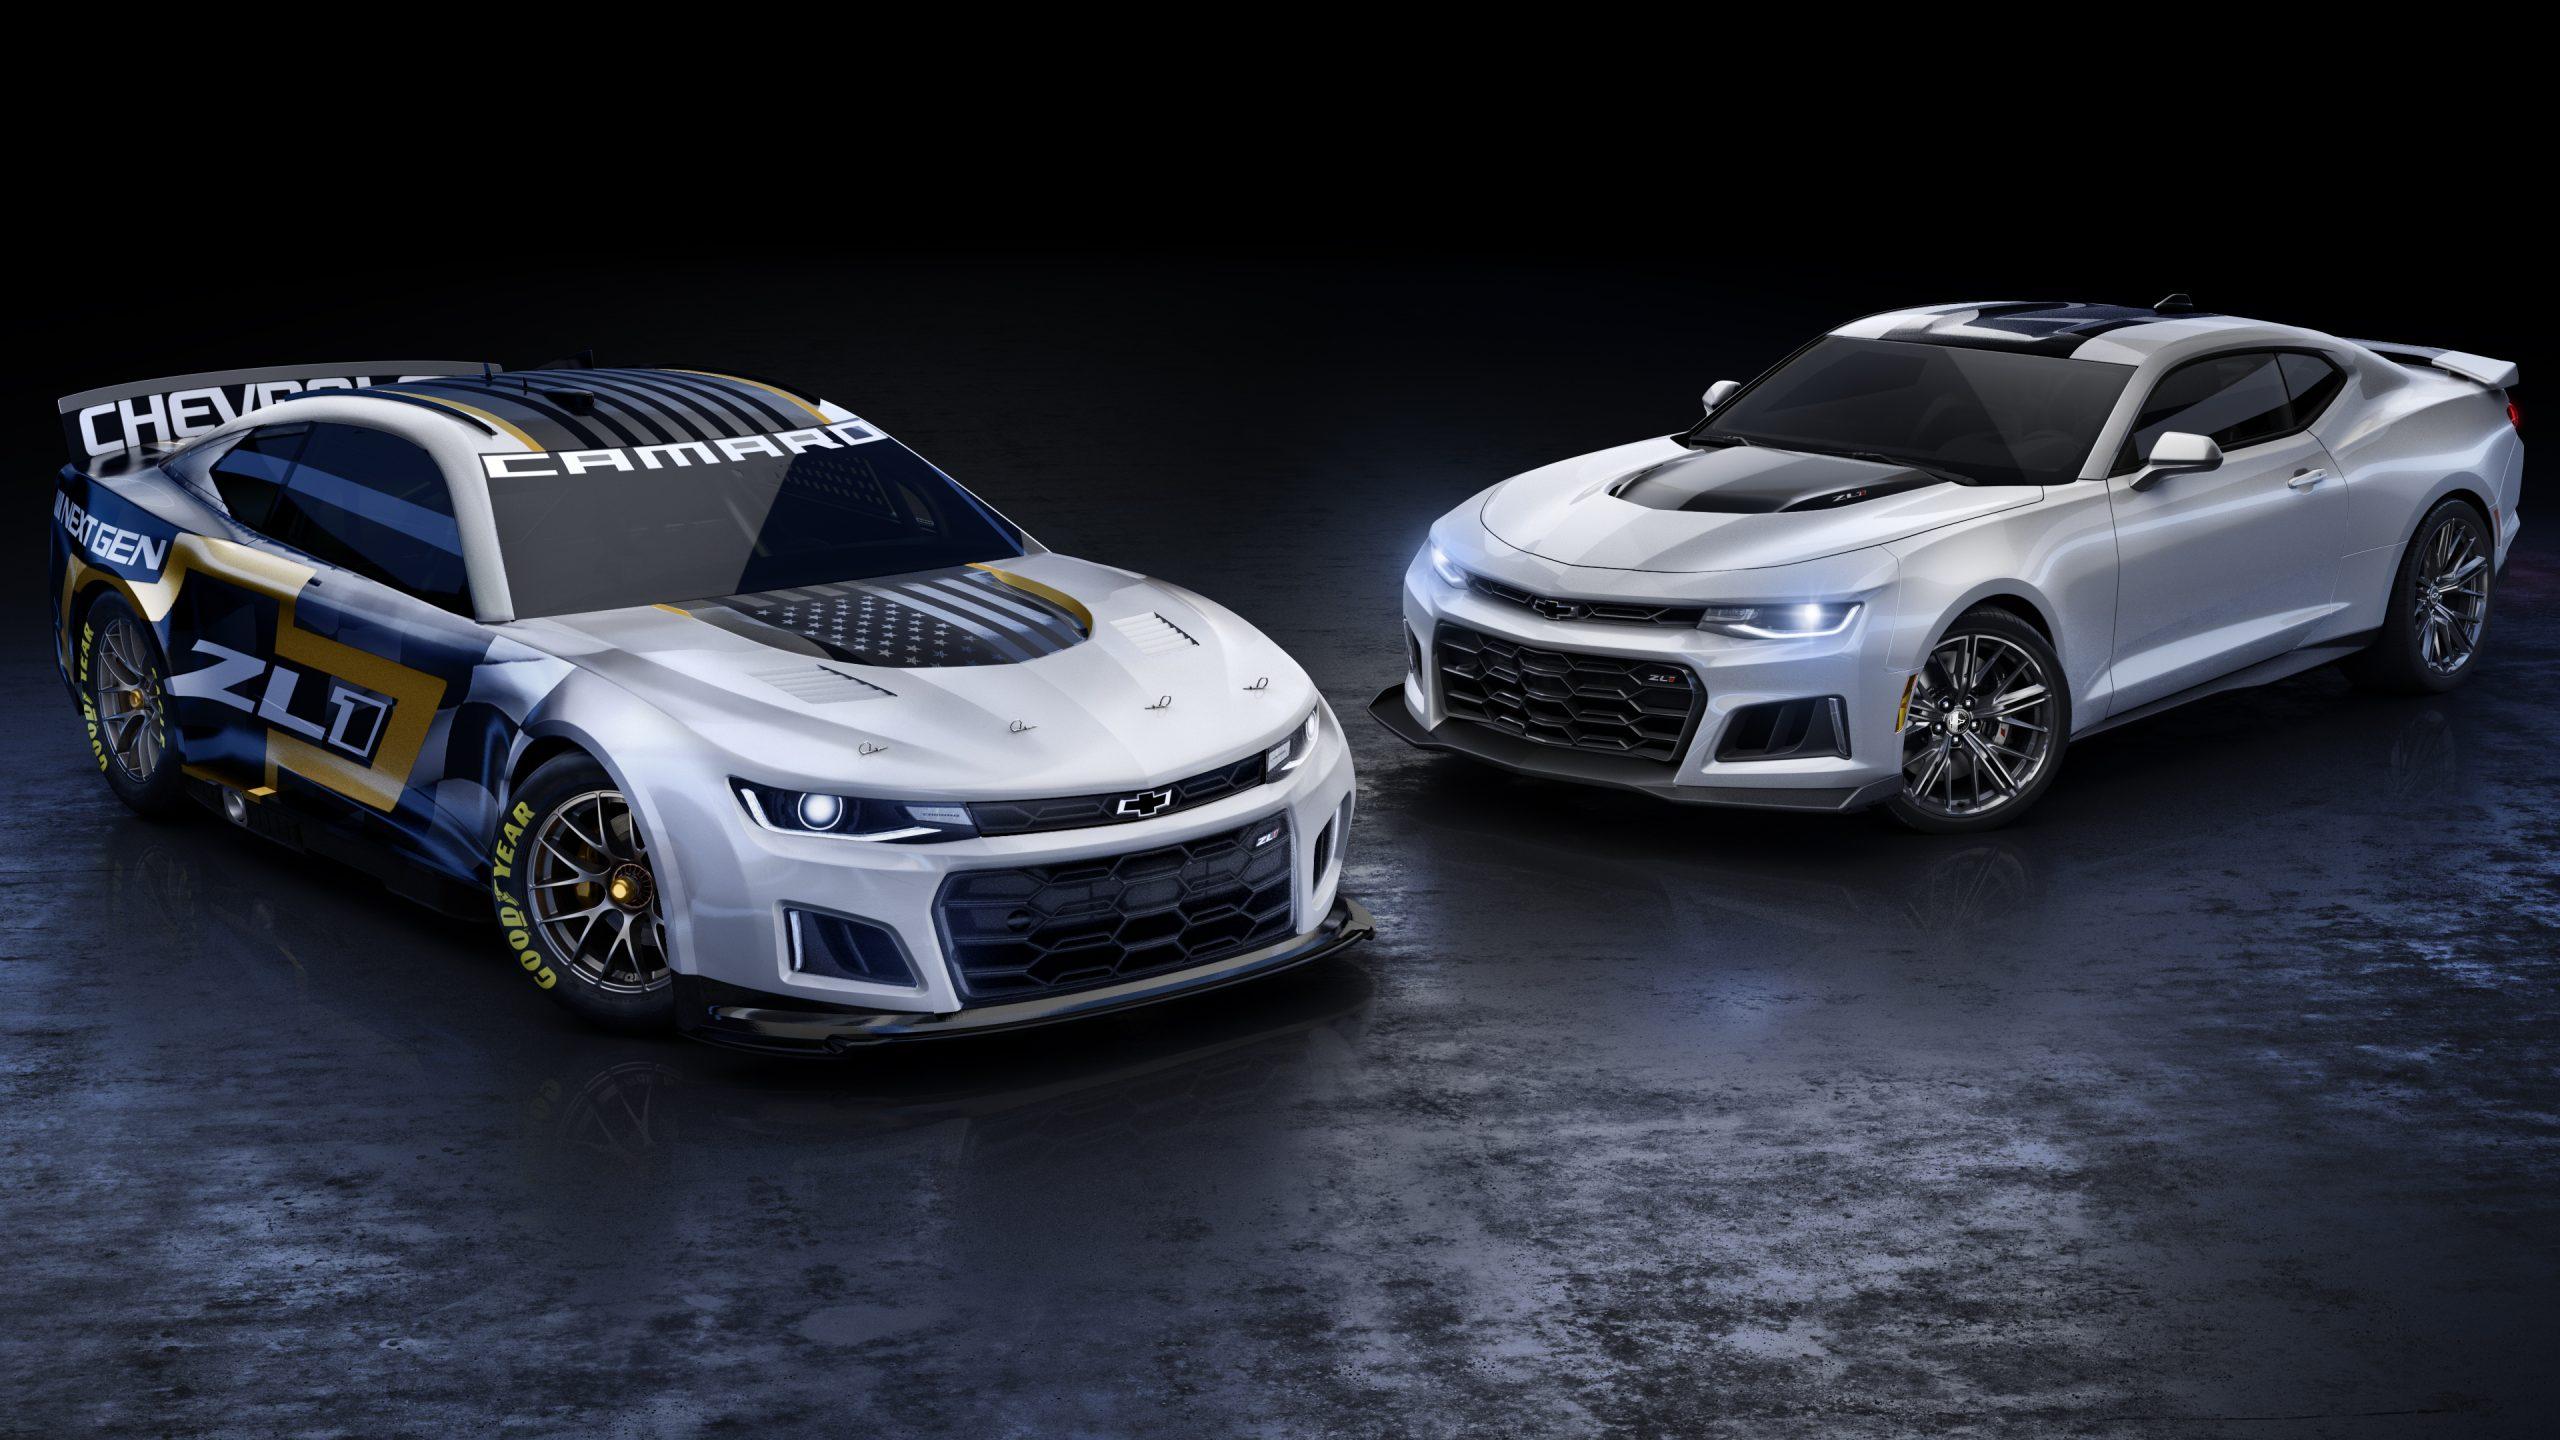 NASCAR Chevrolet Stock Car